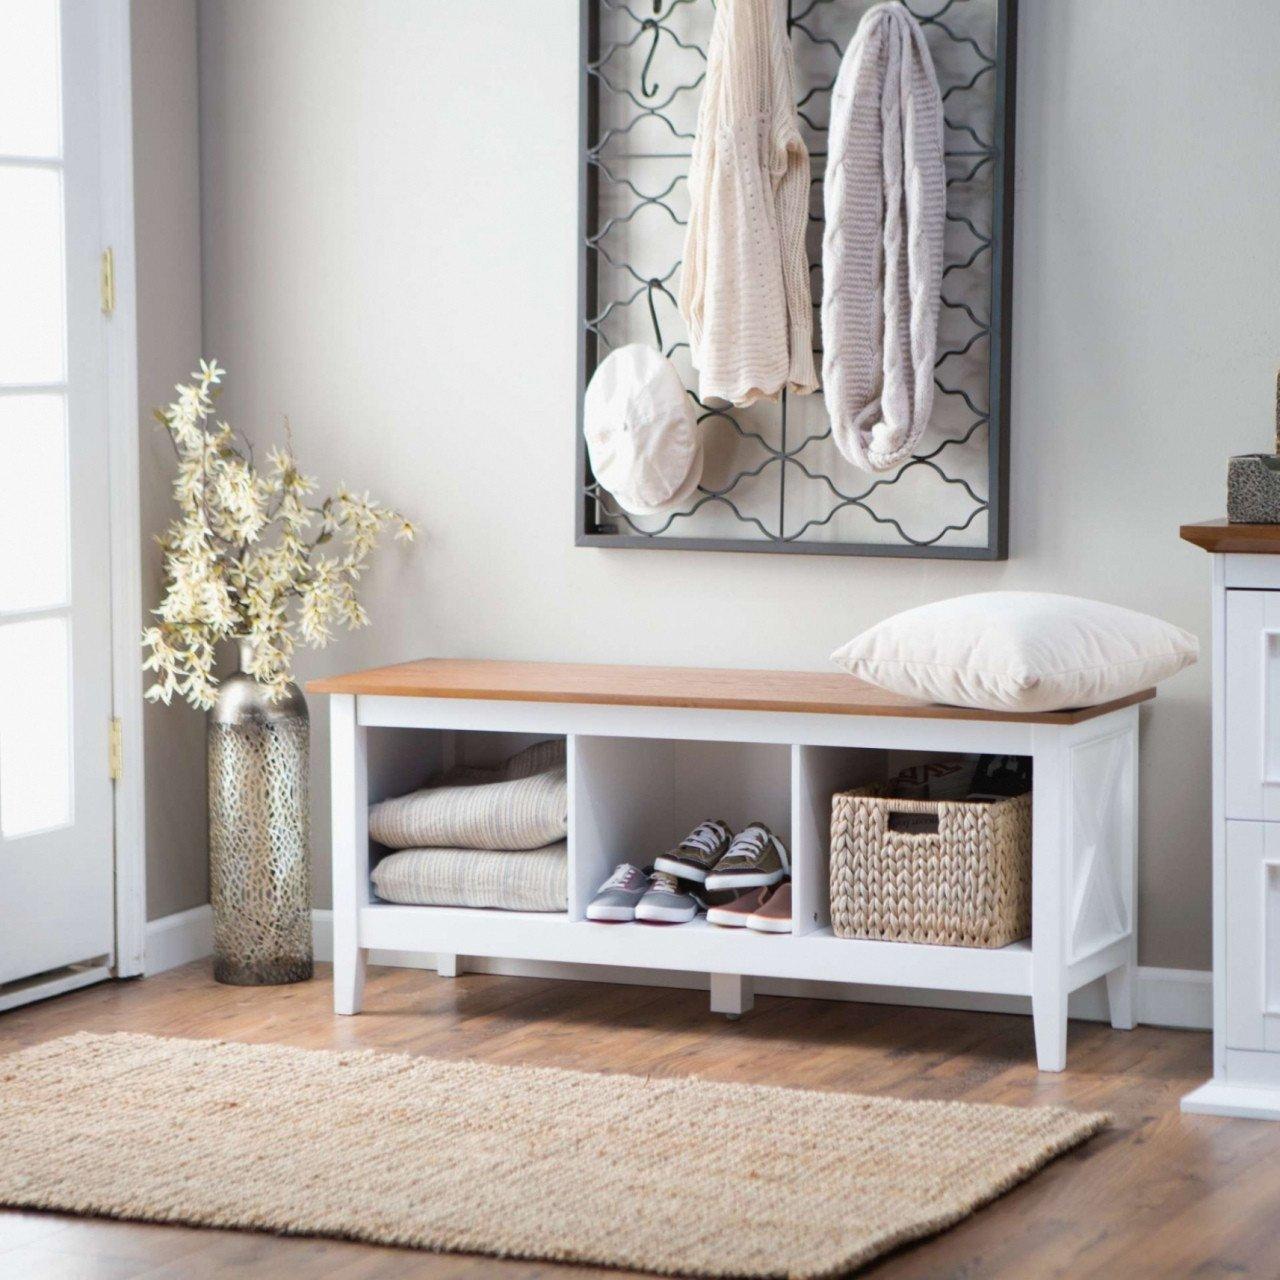 Small Storage Bench for Bedroom Inspirational Shoe Bench Storage — Procura Home Blog